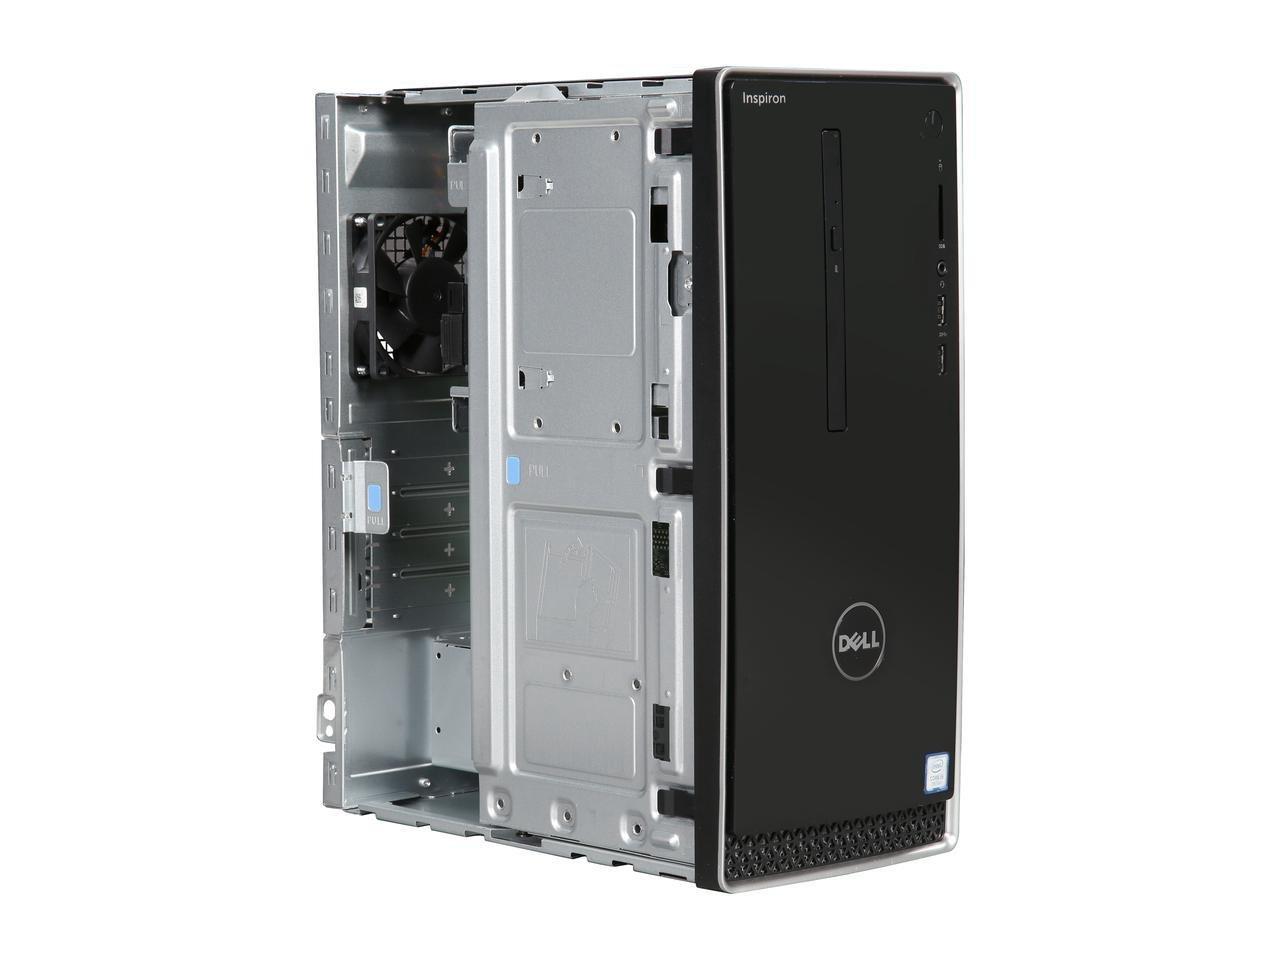 2017 Newest Dell Inspiron 3668 Premium High Performance Business Desktop - Intel Quad-Core i5-7400 3.0GHz, 16GB DDR4, 1TB HDD, DVDRW, Bluetooth, HDMI, WLAN, MaxxAudio, 5-in-1 Media Card Reader, Win 10 by Dell